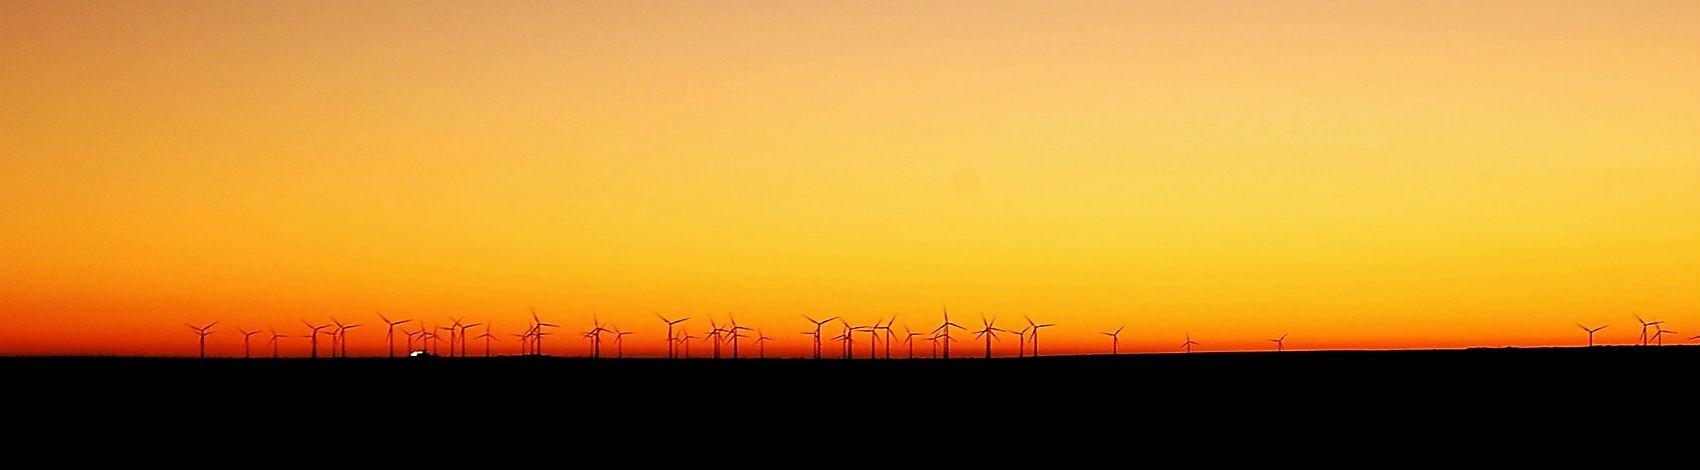 wind-374904_1700 x 470